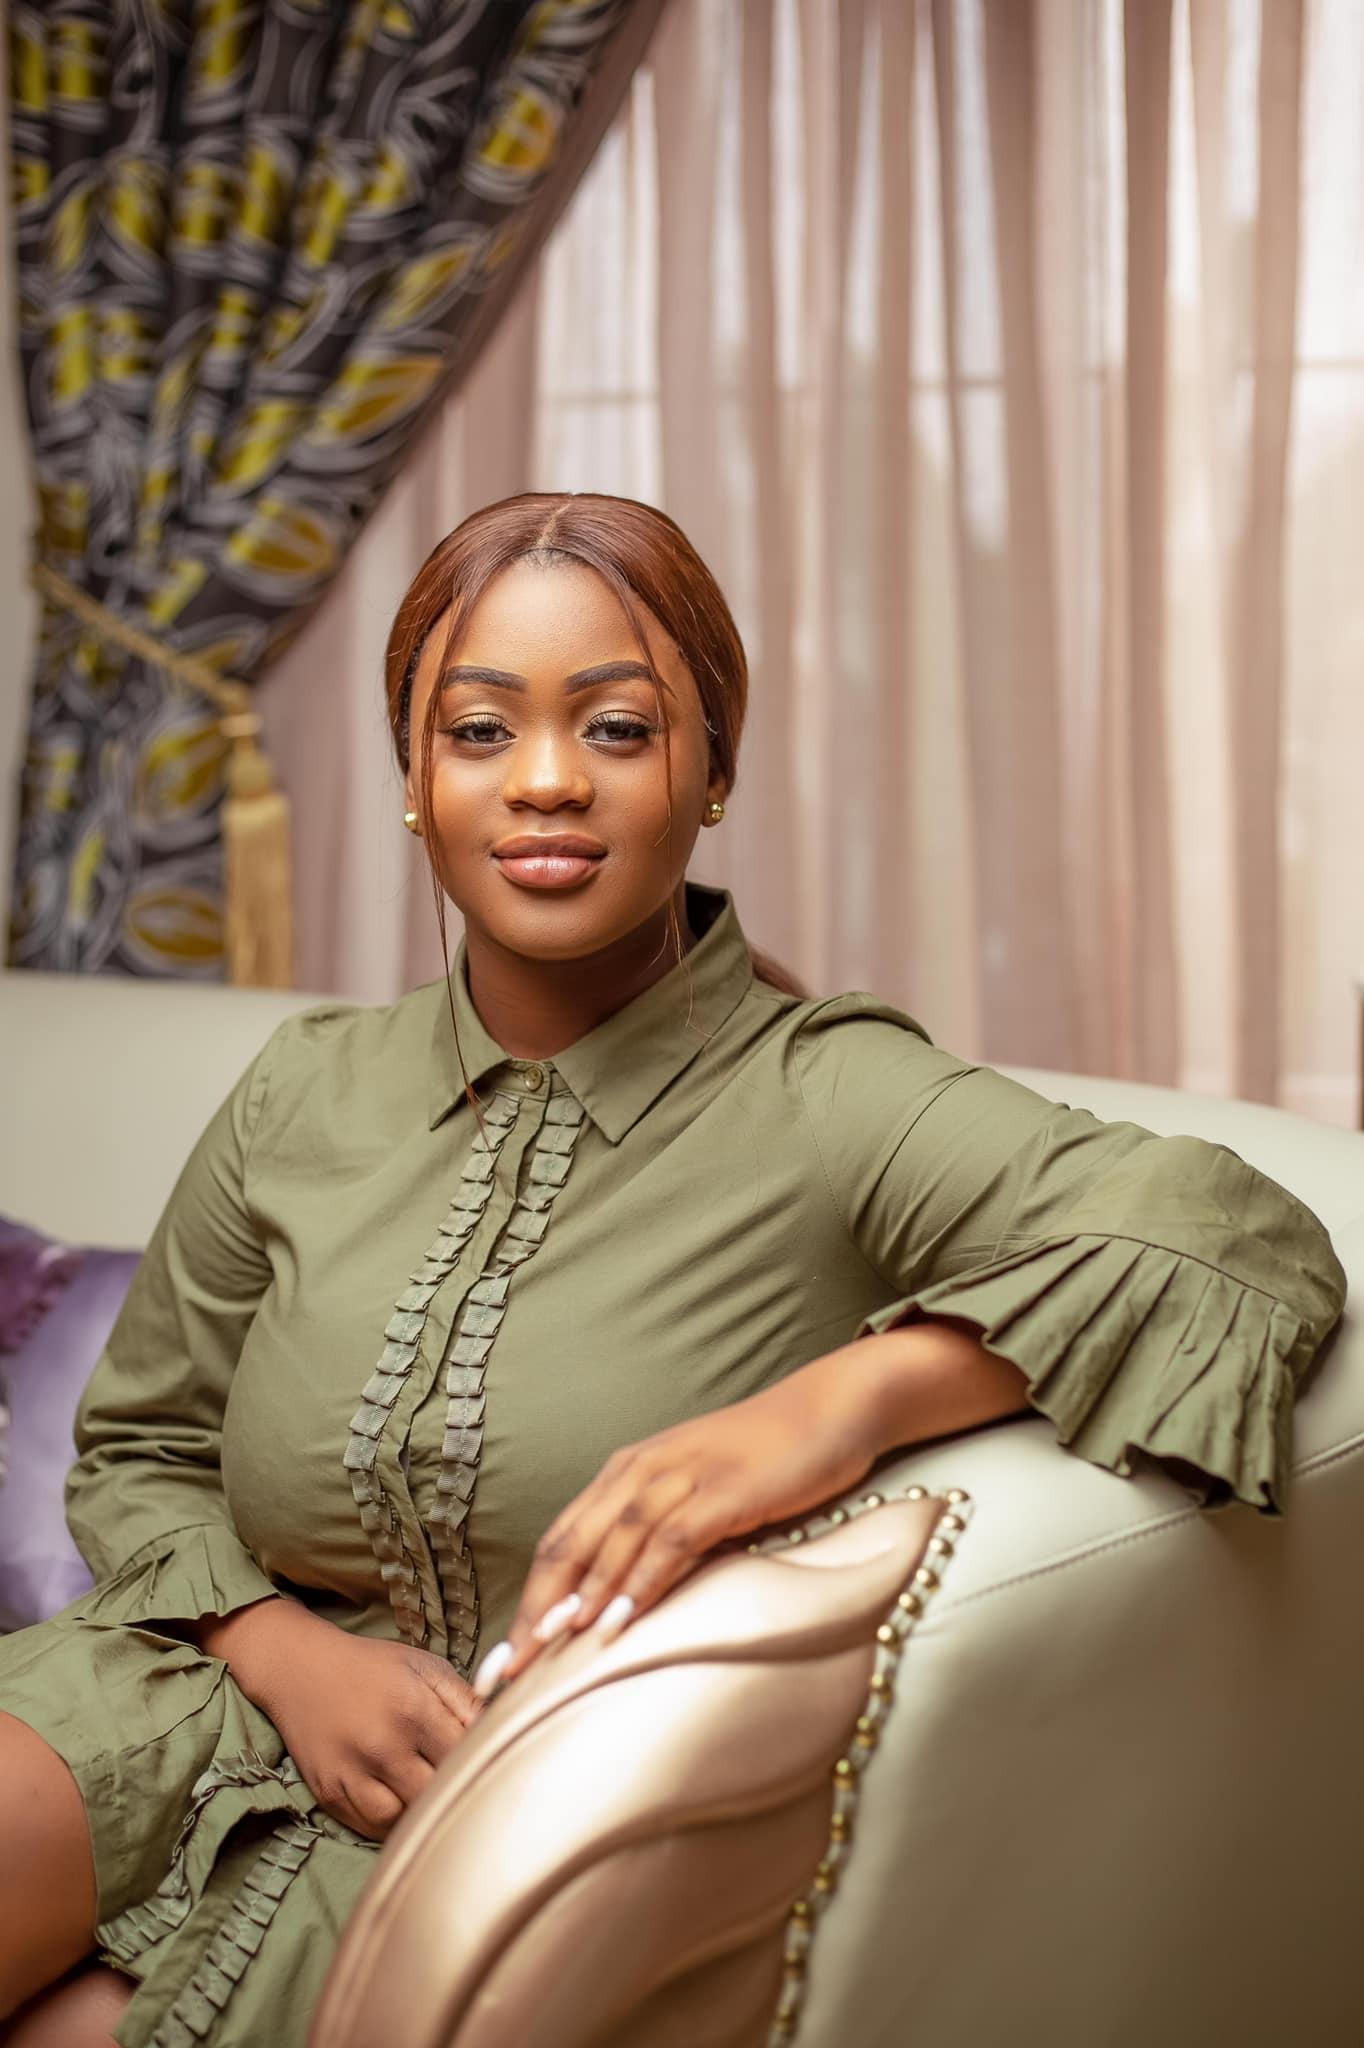 Meet former President Mahama's all grown daughter, Farida Mahama who is  stealing the show on social media | Pulse Ghana